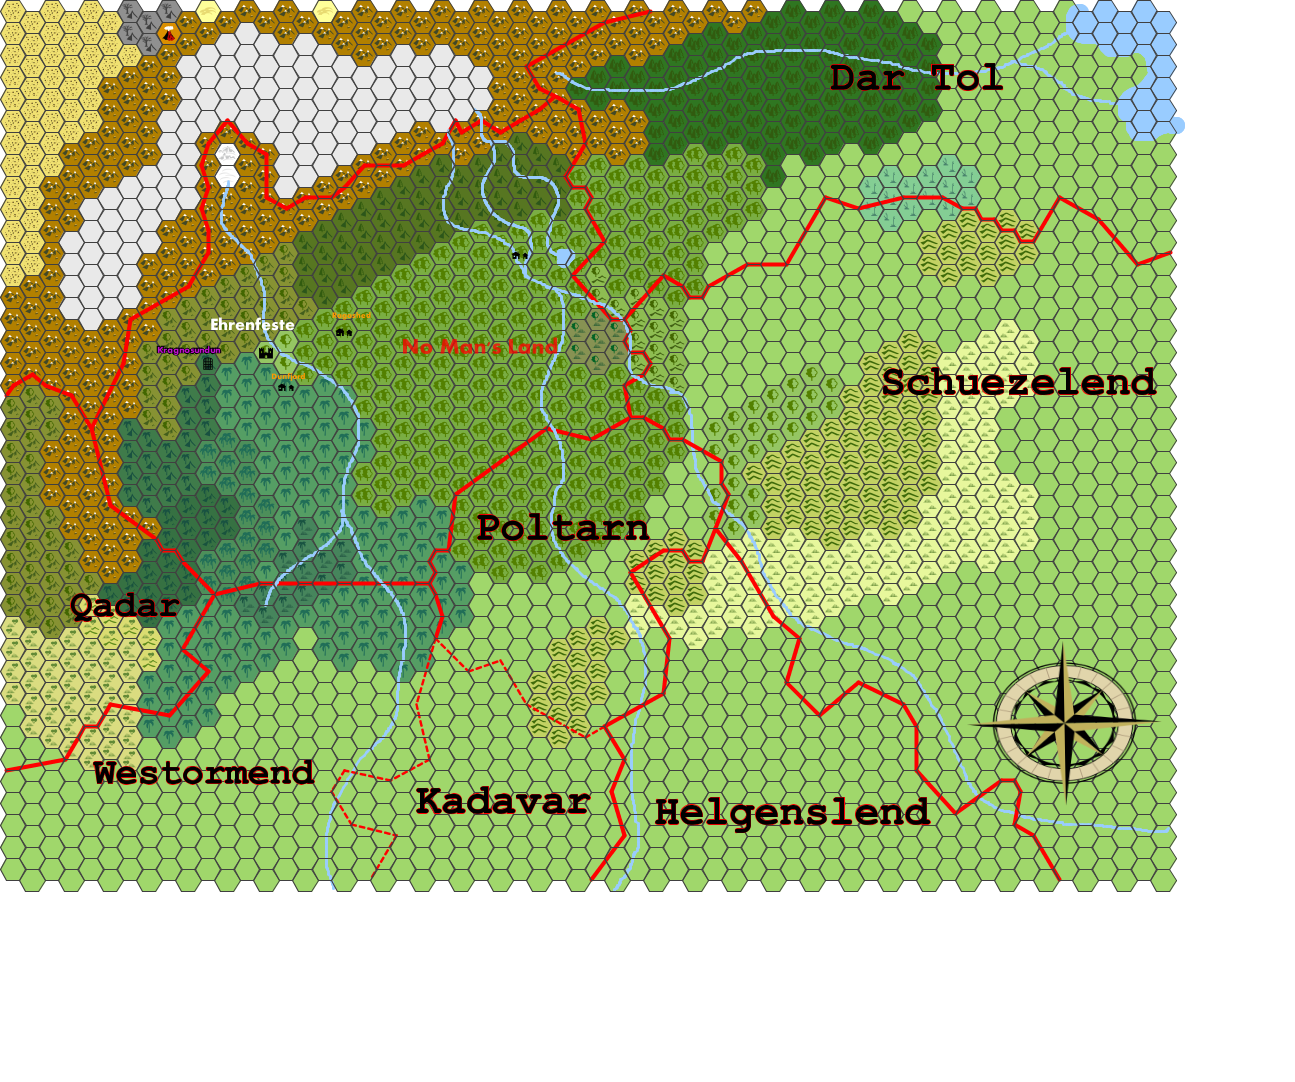 overlandmap